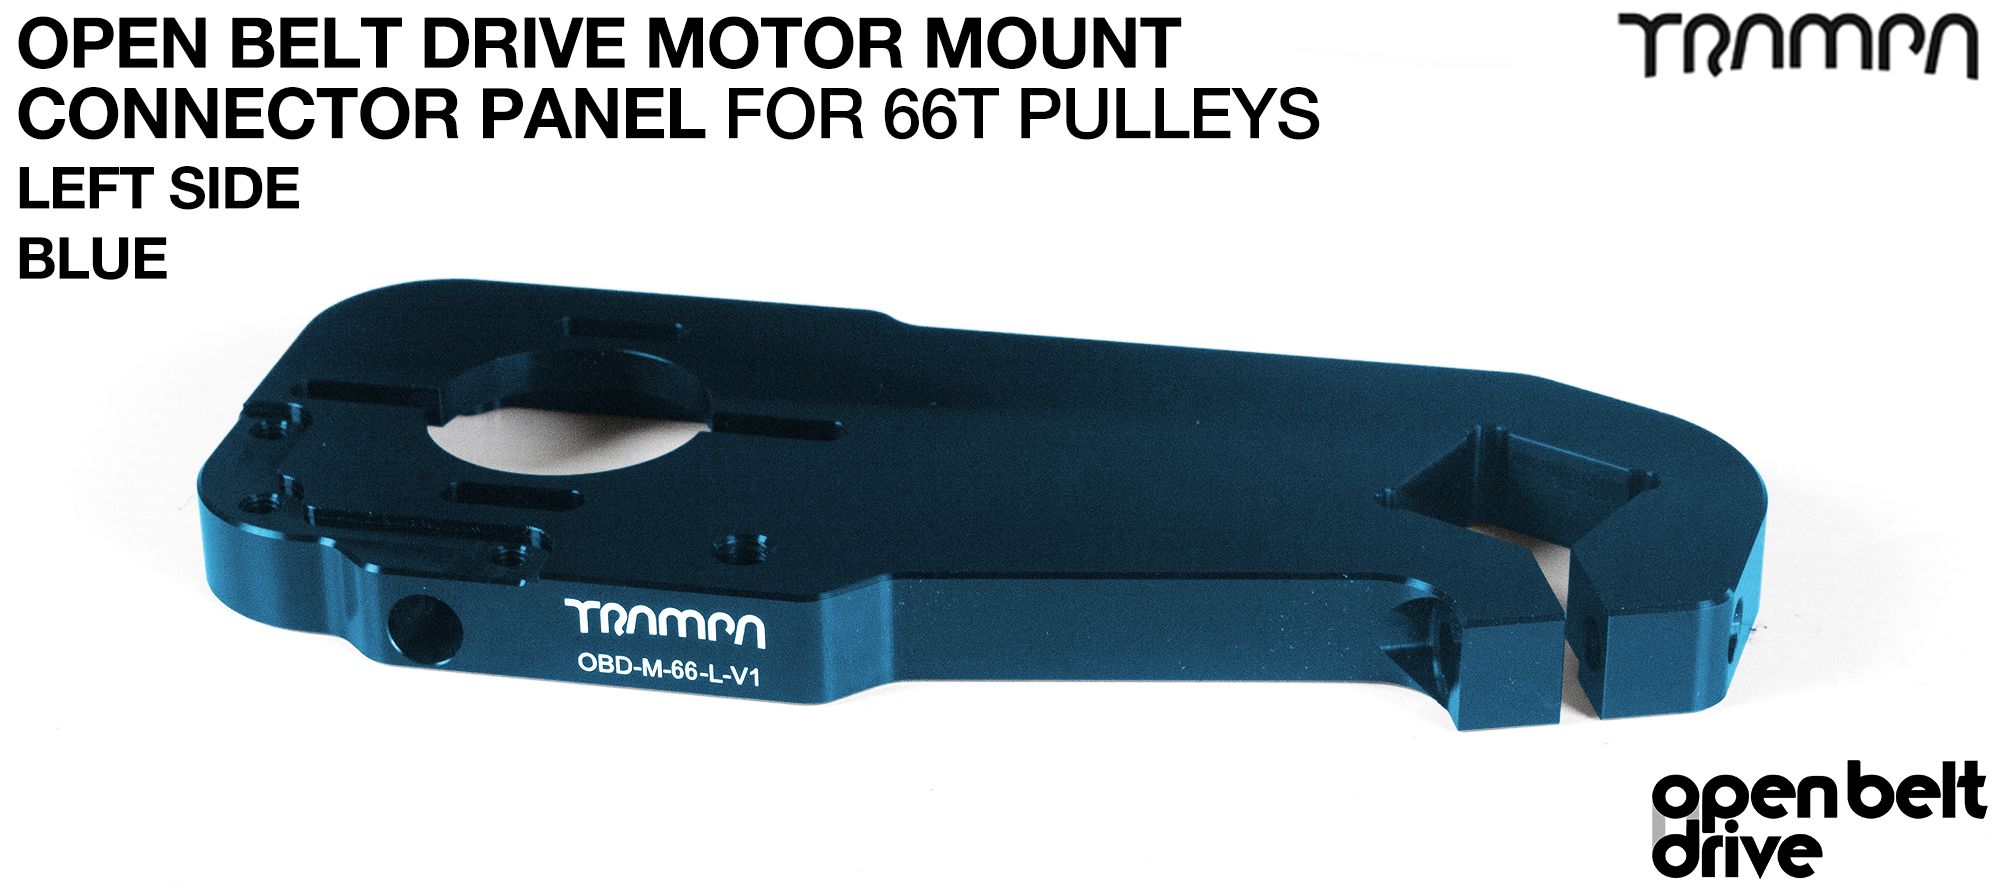 OBD Motor Mount Connector Panel for 66 tooth Pulleys - REGULAR - BLUE